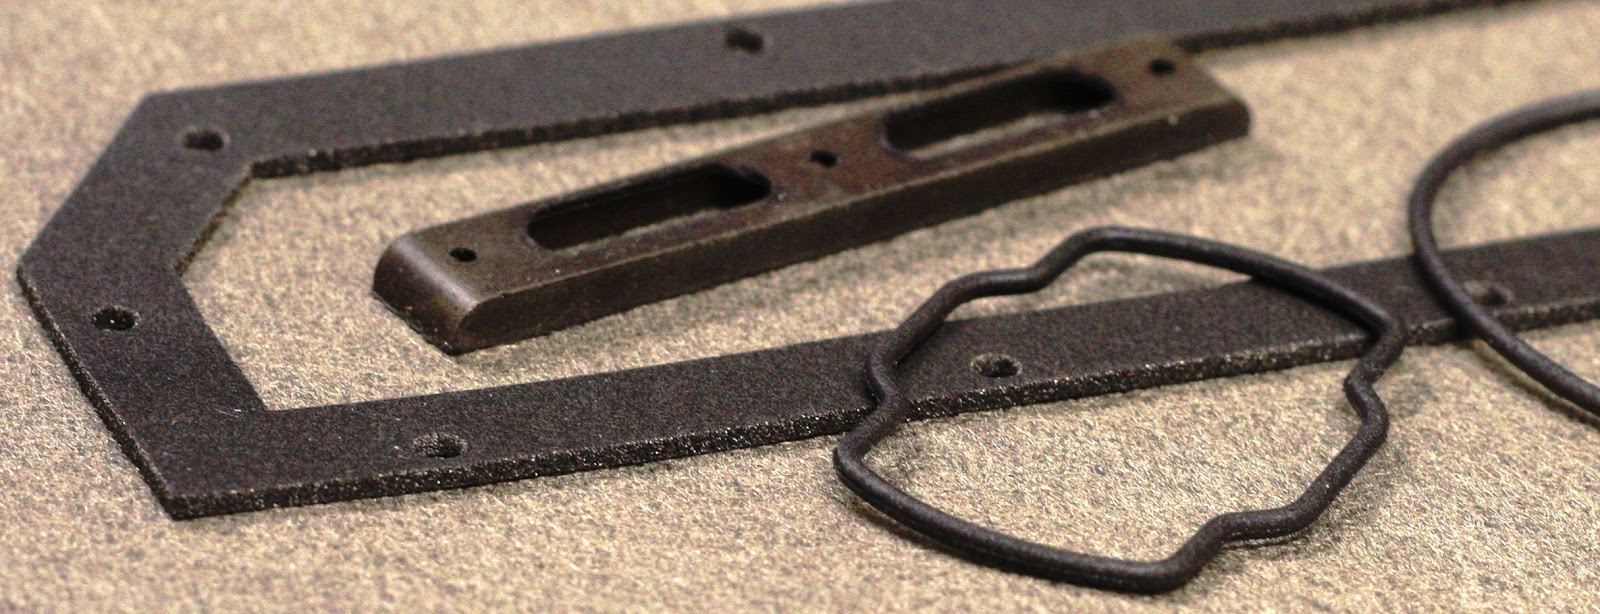 William stockwell resume stockwell elastomerics